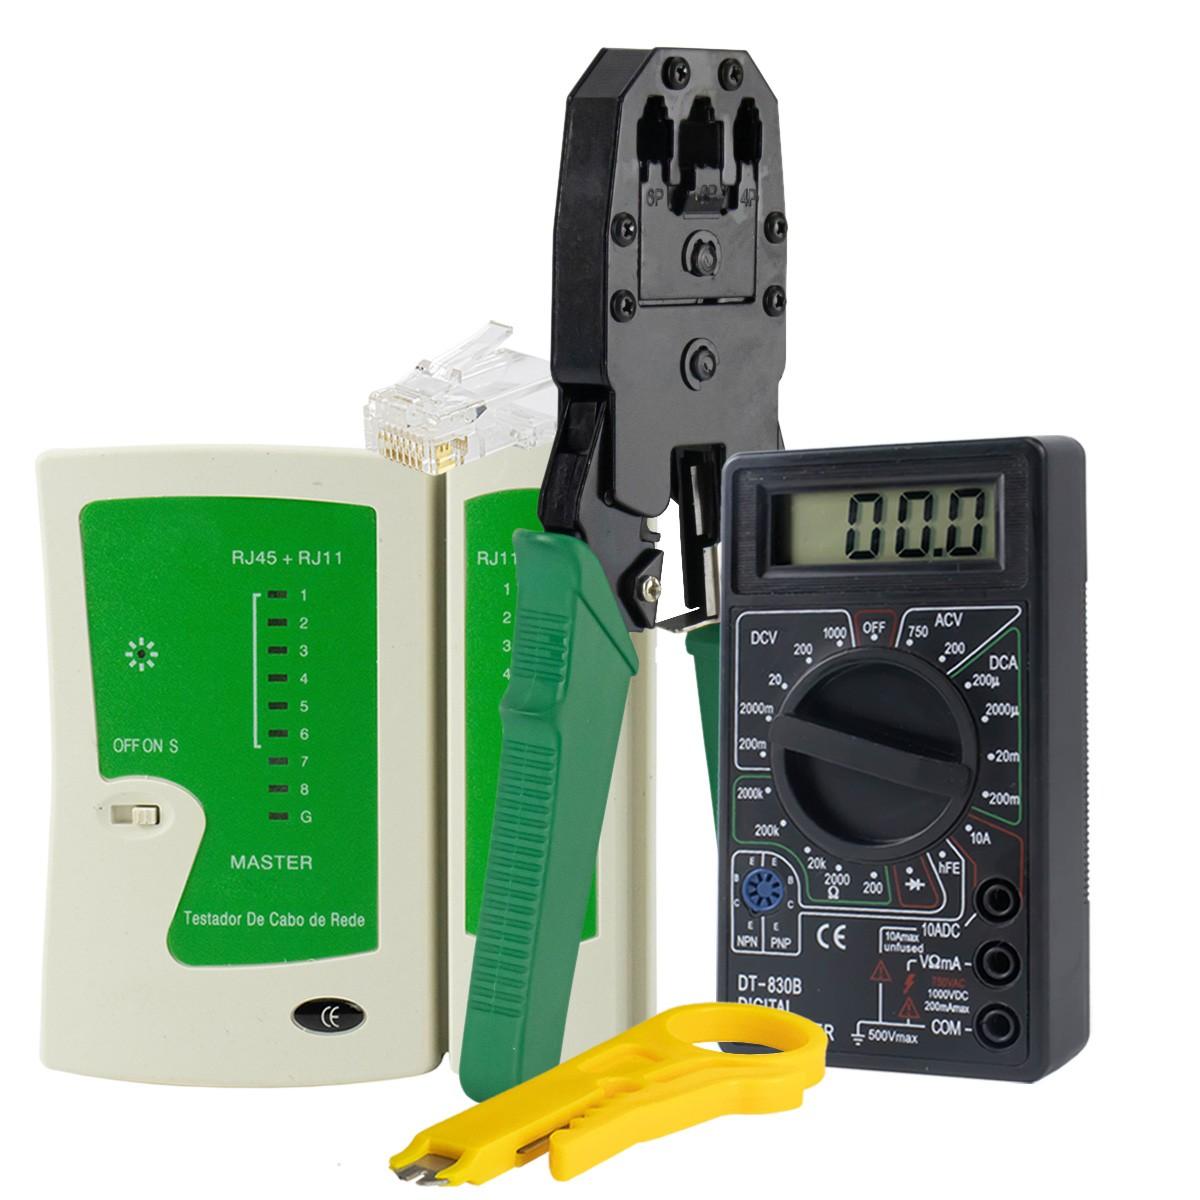 KIT Alicate p/ Crimpagem RJ45 e RJ11 + Testador de Cabos RJ45 + 100x Conectores RJ45 + Multímetro XT-573